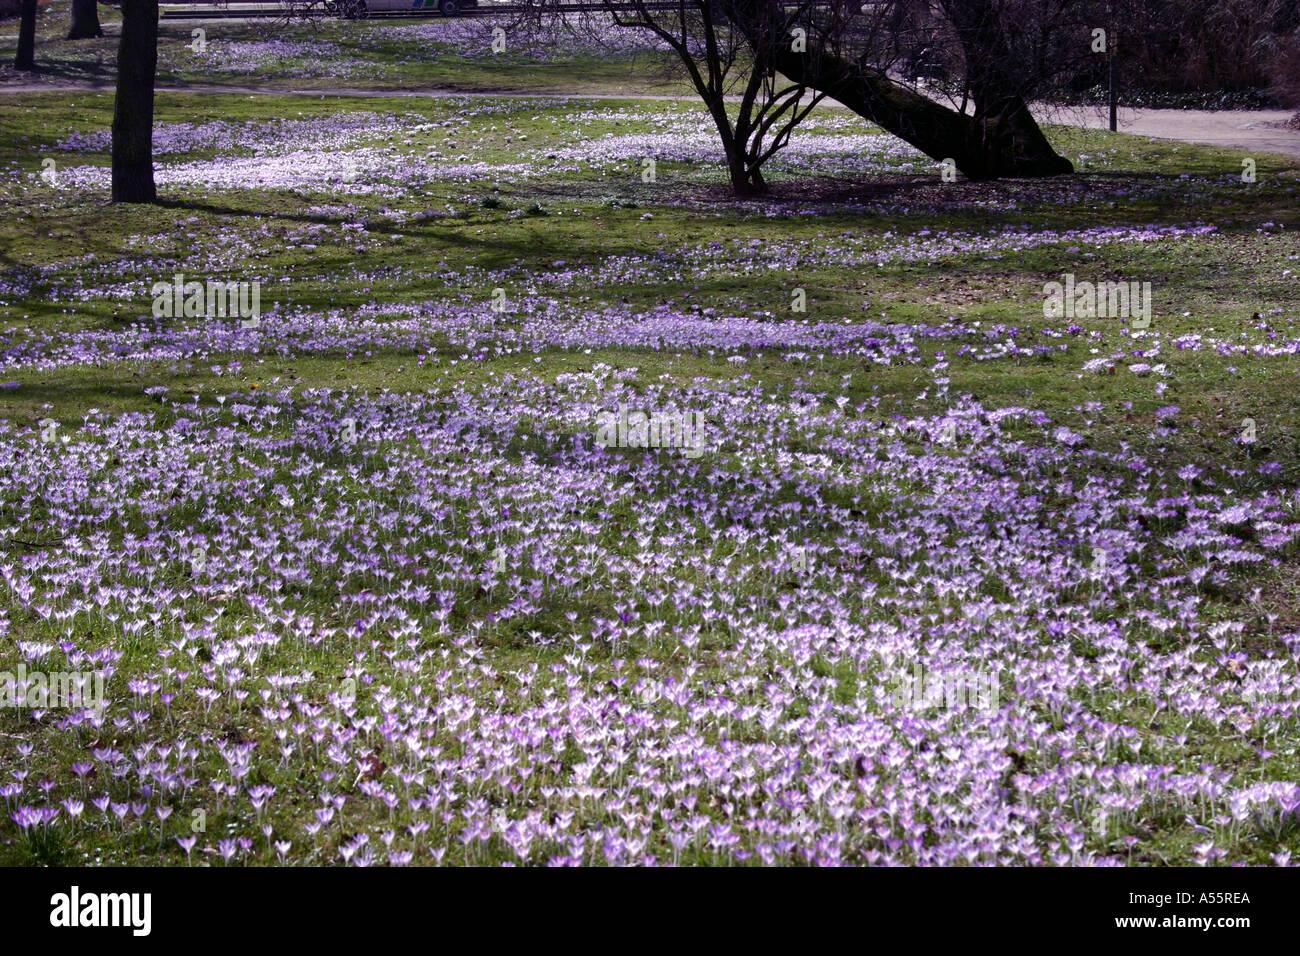 Crocus field flowering in spring Lenbachplatz Munich Bavaria Germany - Stock Image